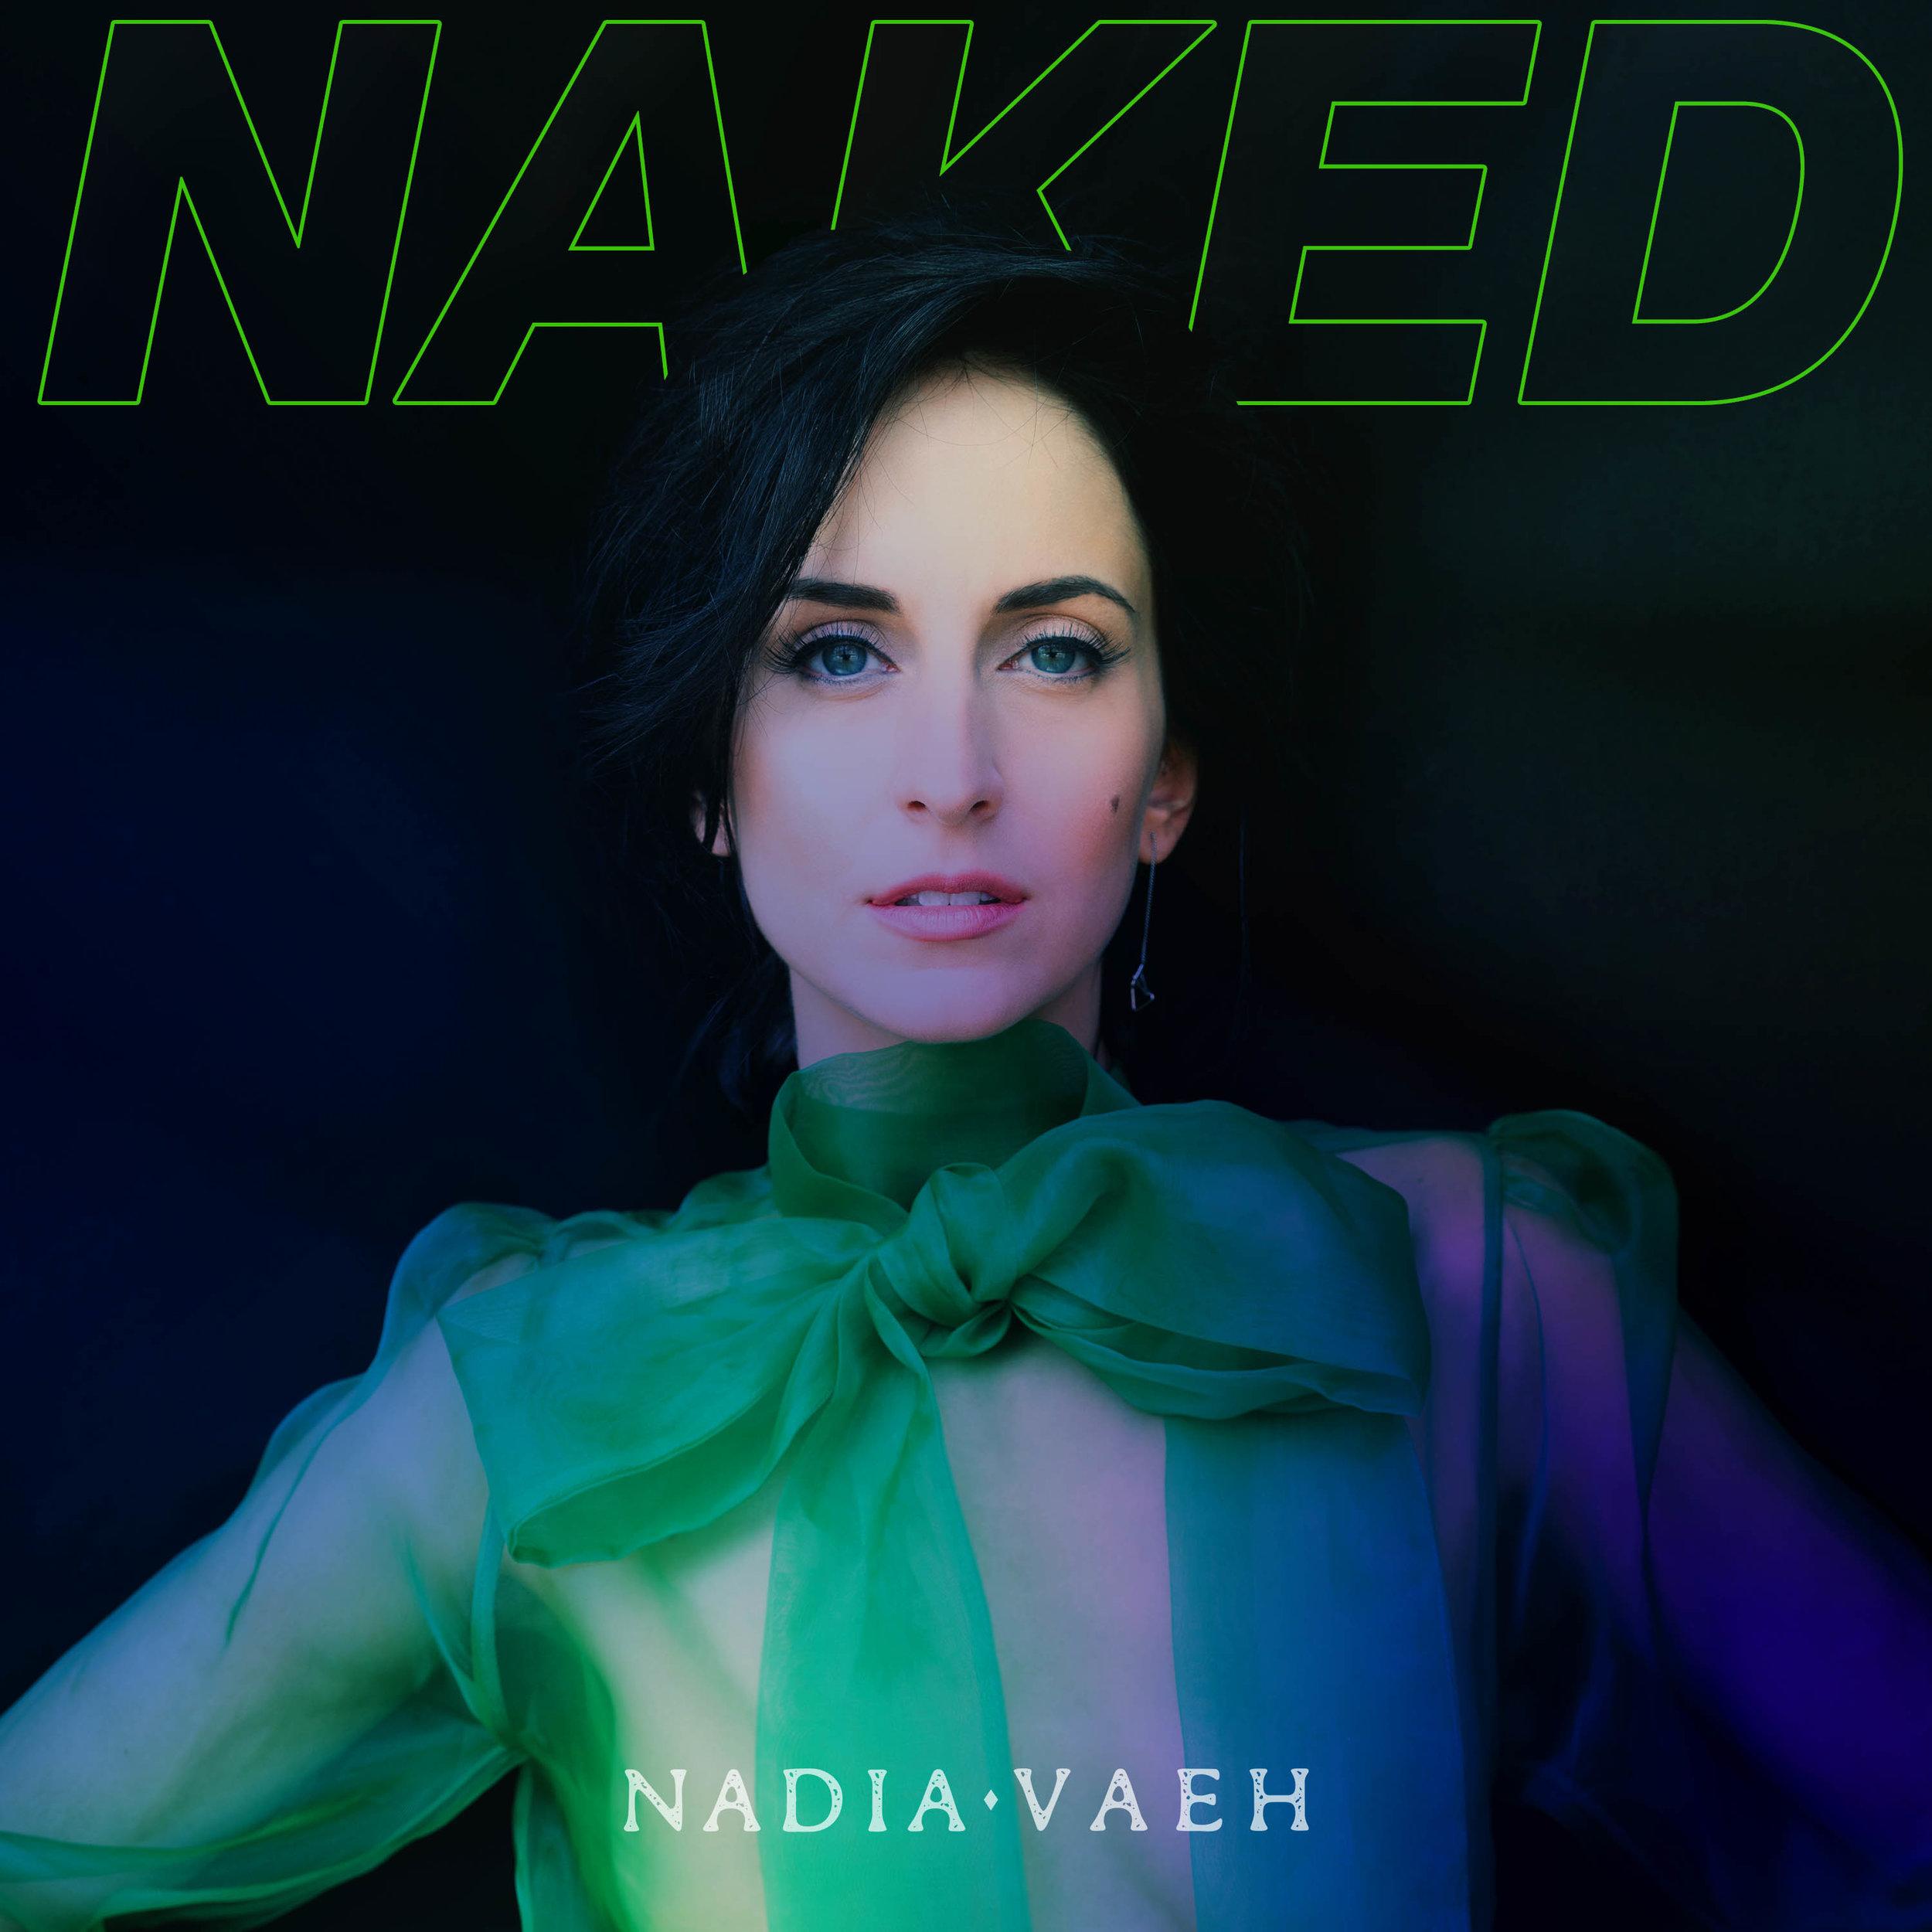 Nadia Vaeh Naked